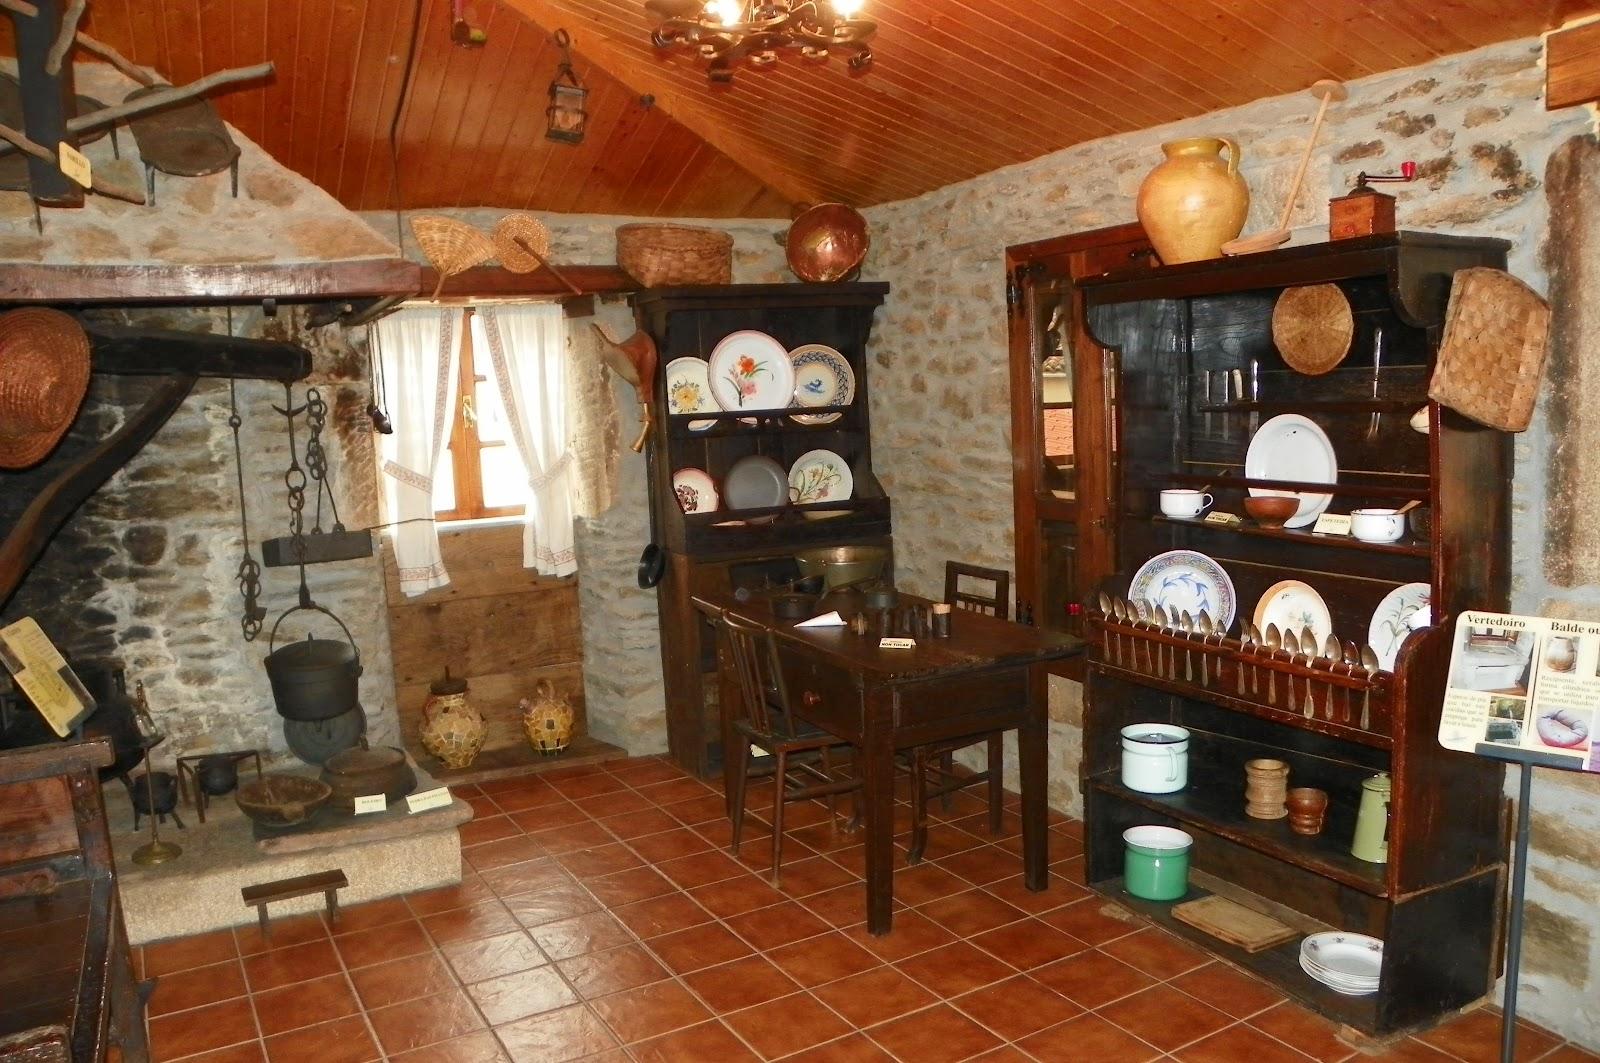 Turismo Enxebre 06 01 2012 07 01 2012 # Muebles Justo O Grove